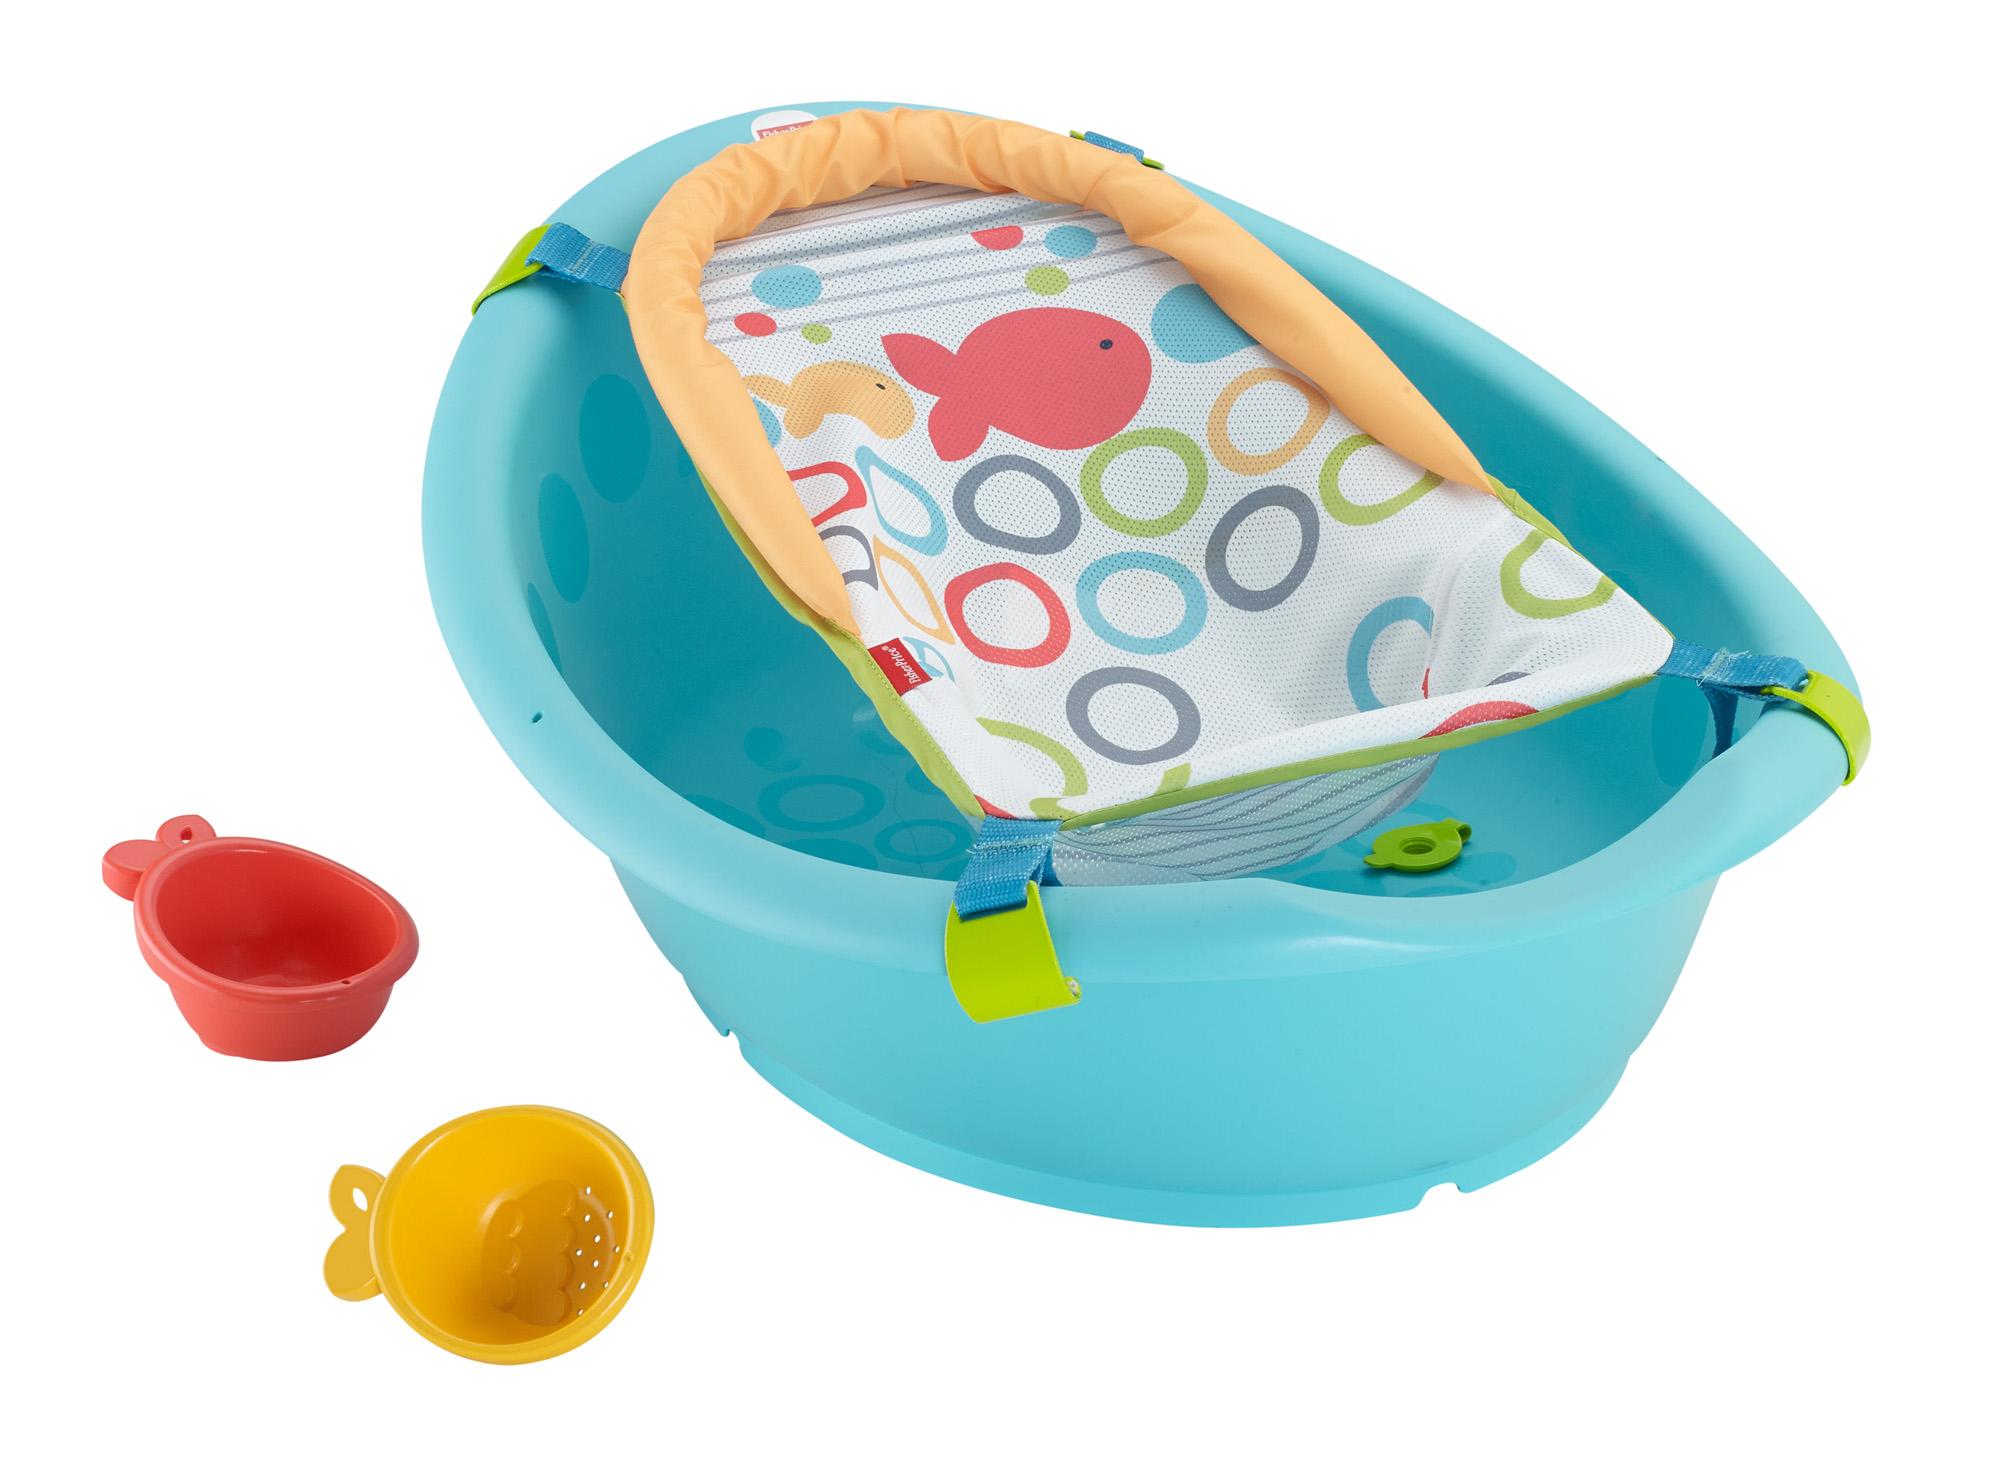 Fisher-Price Rinse \'N Grow Baby/Toddler Bath Tub│X2 Goldfish Bath ...